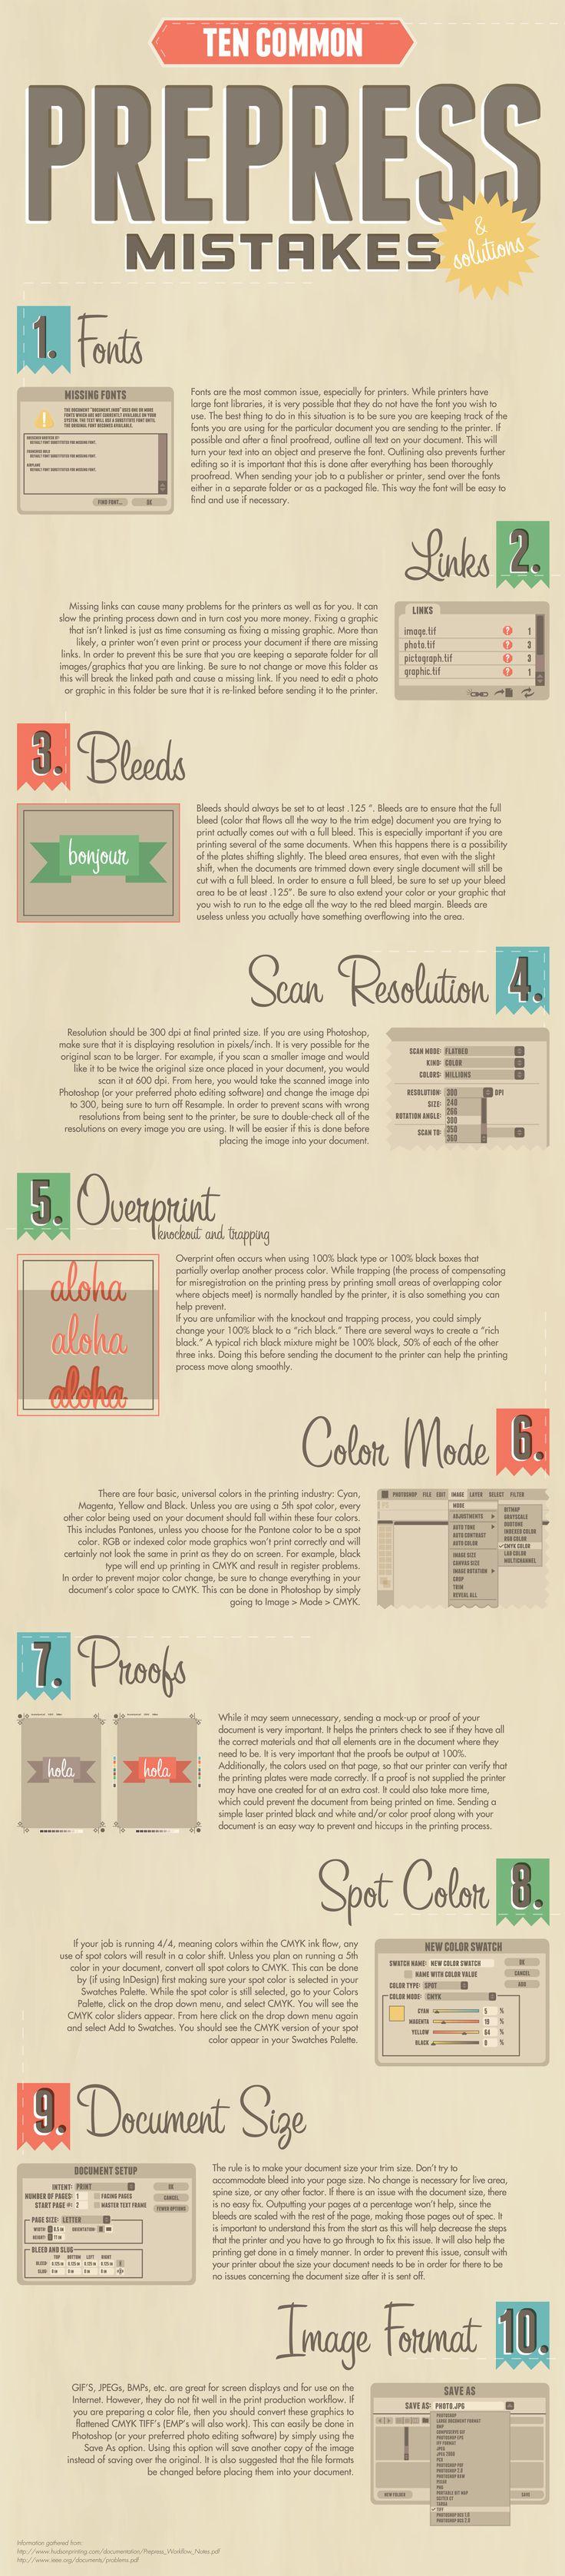 Ten Common Prepress Mistakes Infographic http://s3images.coroflot.com/user_files/individual_files/original_457425_i5nJ_ct9ueVMZw_ZMy4dAha7x.jpg